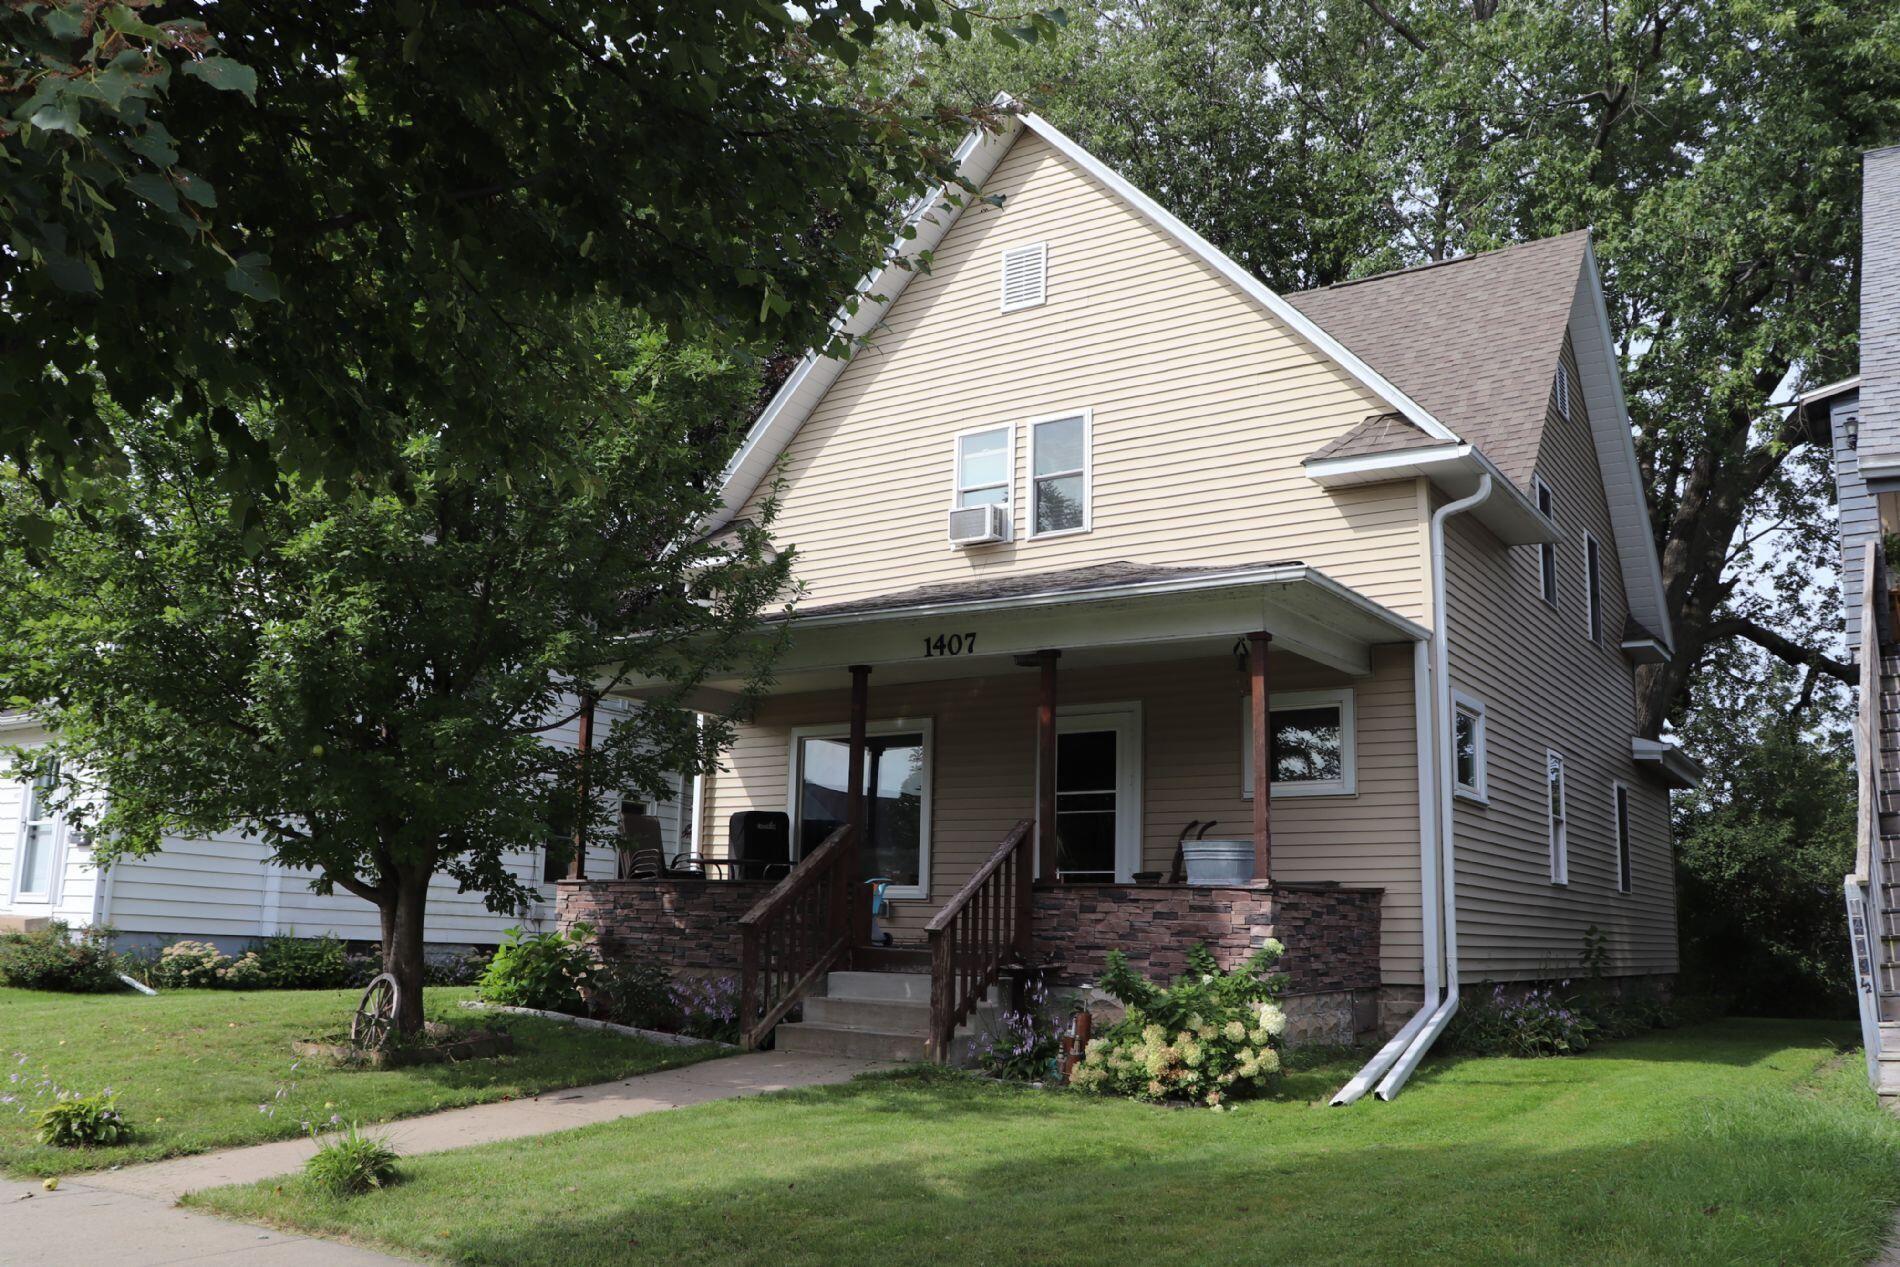 1407 Stoughton Ave, Tomah, WI 54660 - MLS#: 1761748